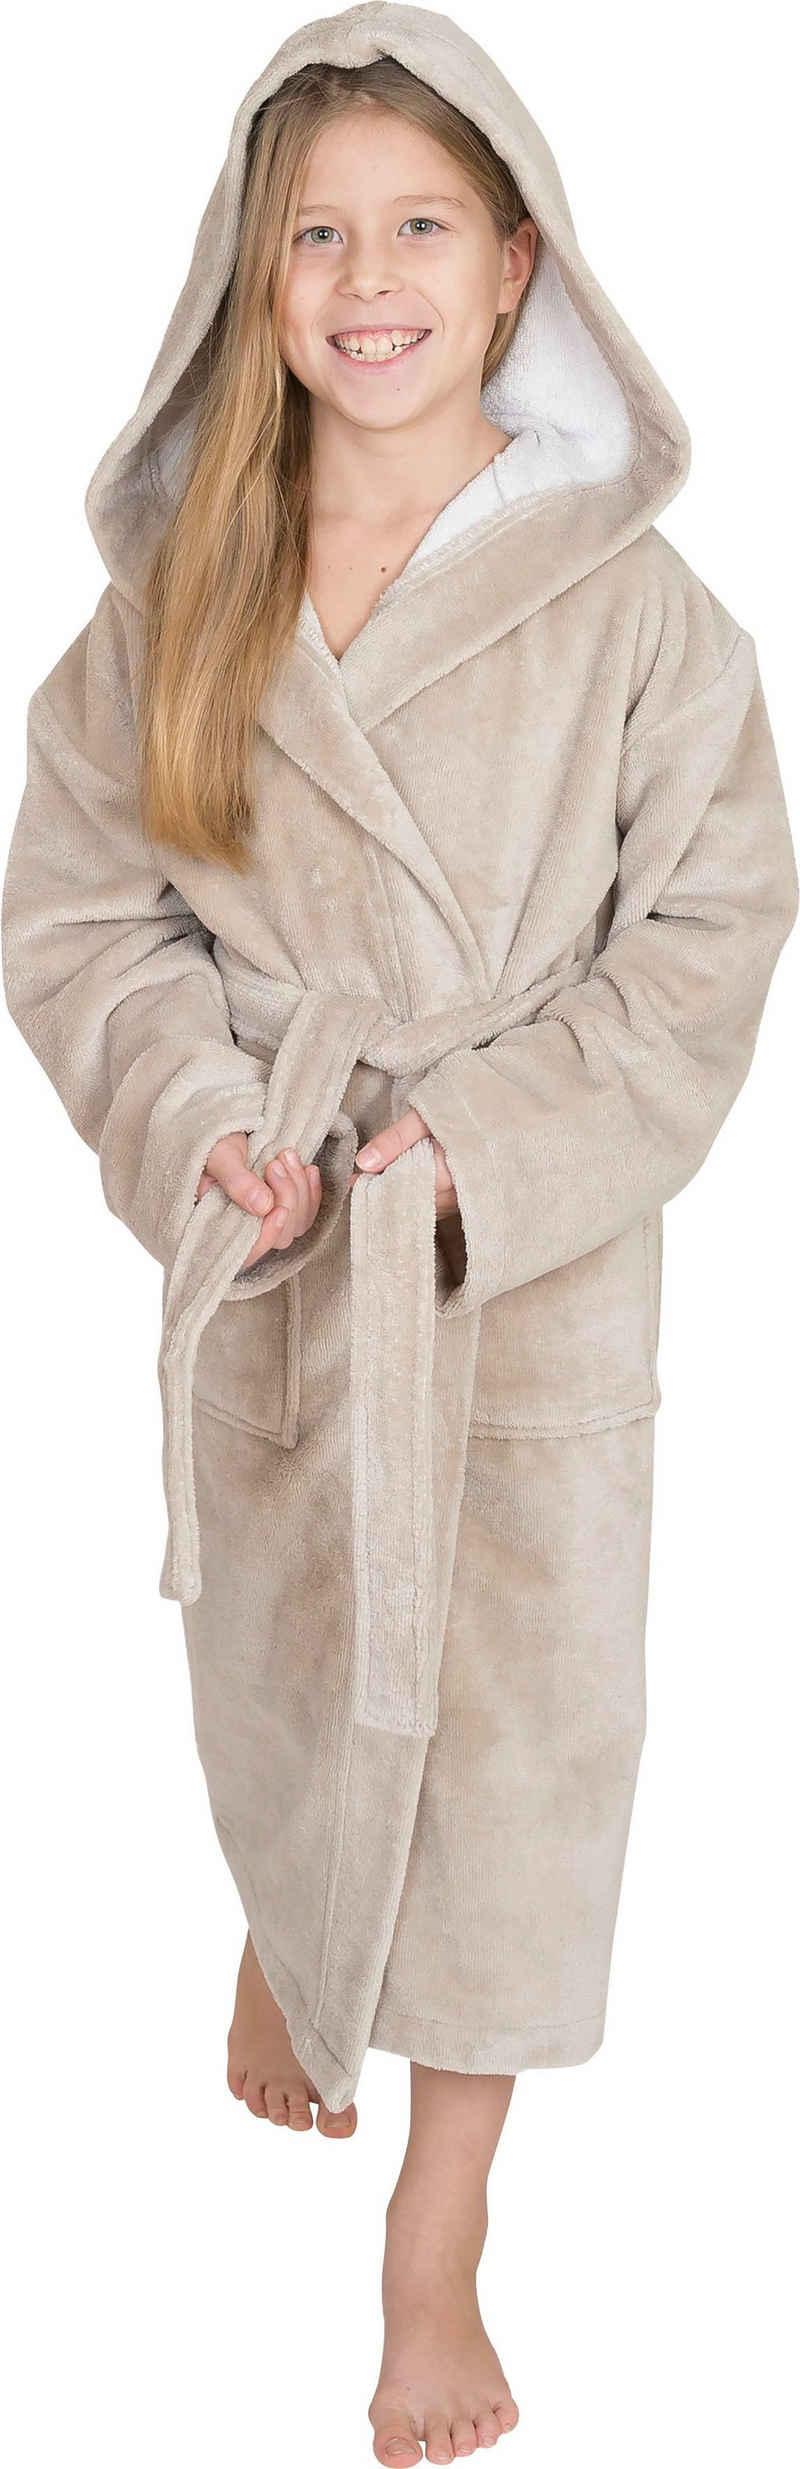 Kinderbademantel »8521«, Wewo fashion, mit Soft Touch